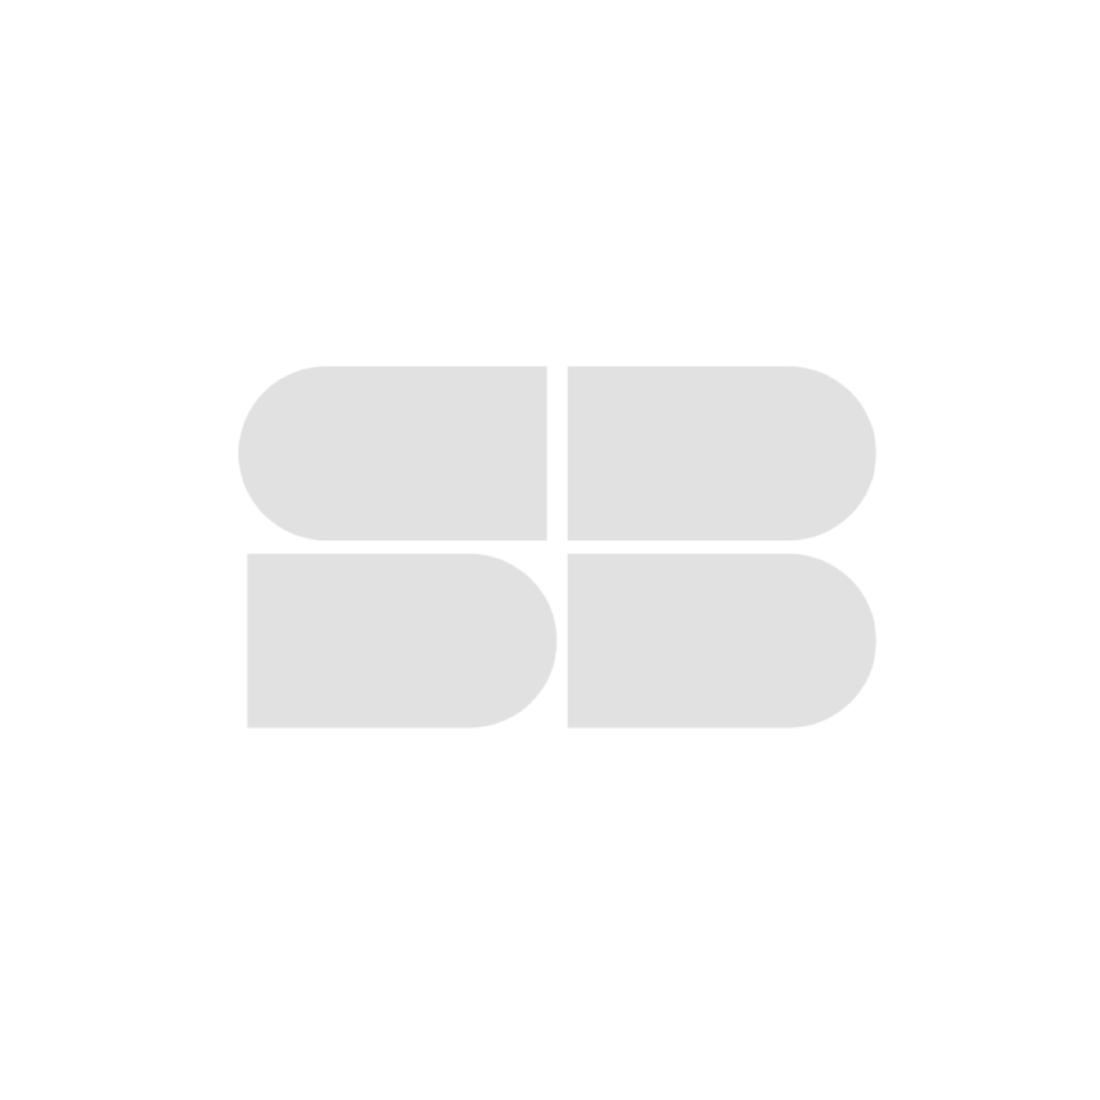 39014165-mattress-bedding-bedding-blankets-duvets-31